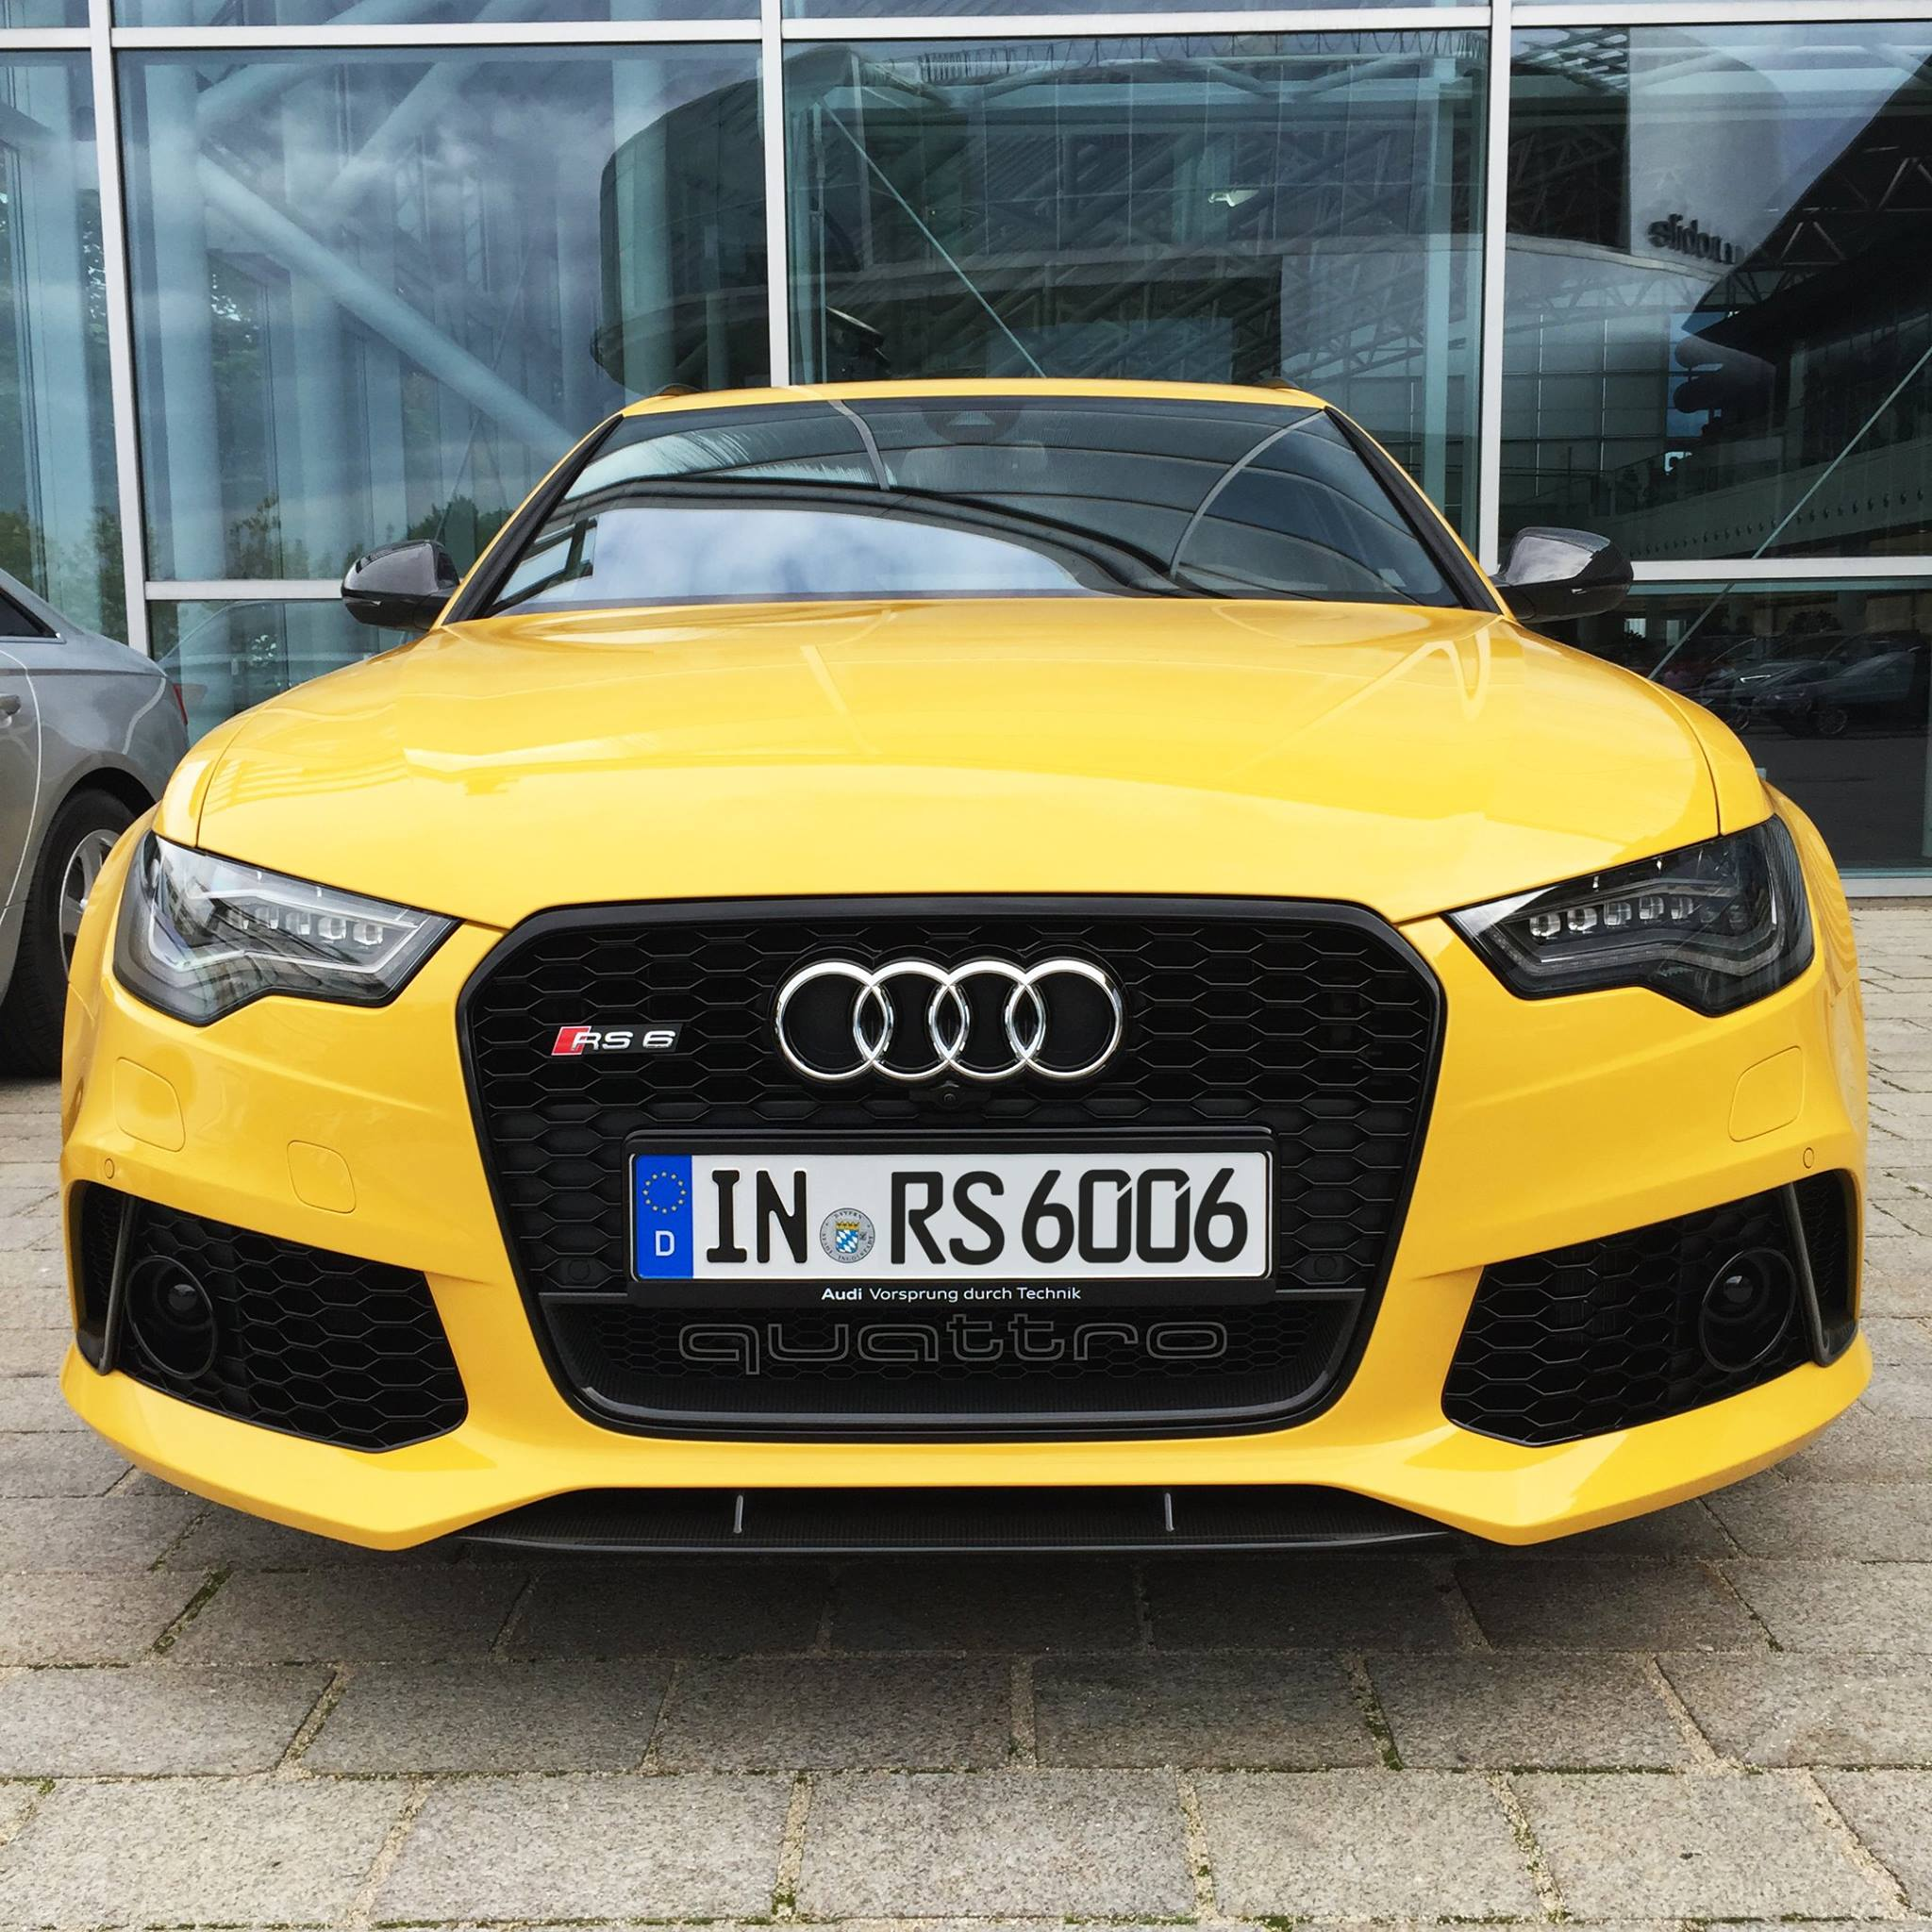 Audi Rs6 Avant In Speed Yellow Speedgelb At Audi Forum Ingolstadt